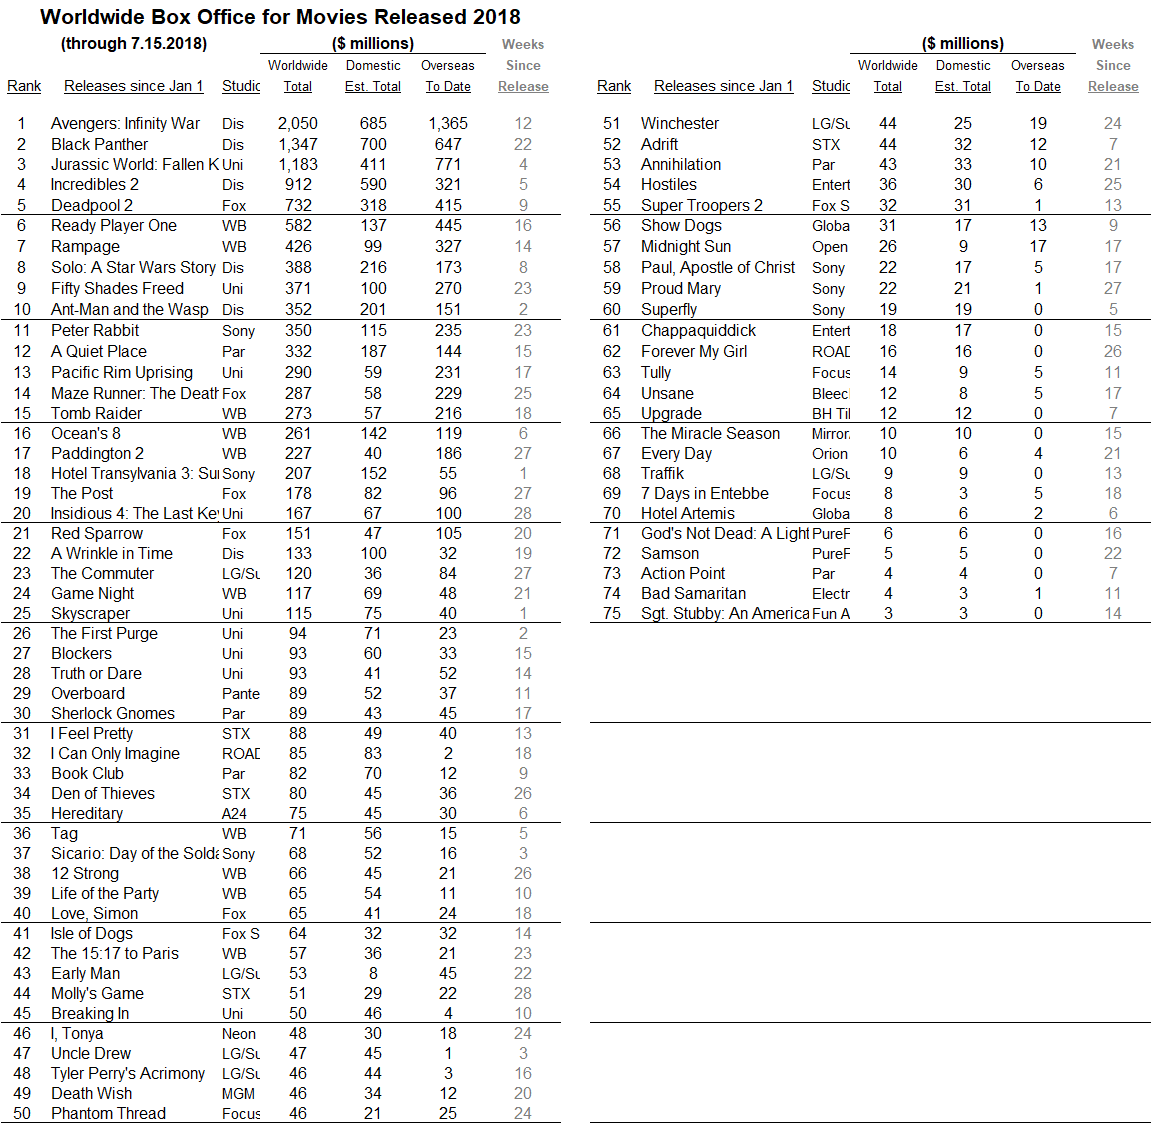 International 2018 through 2018 Jul 15